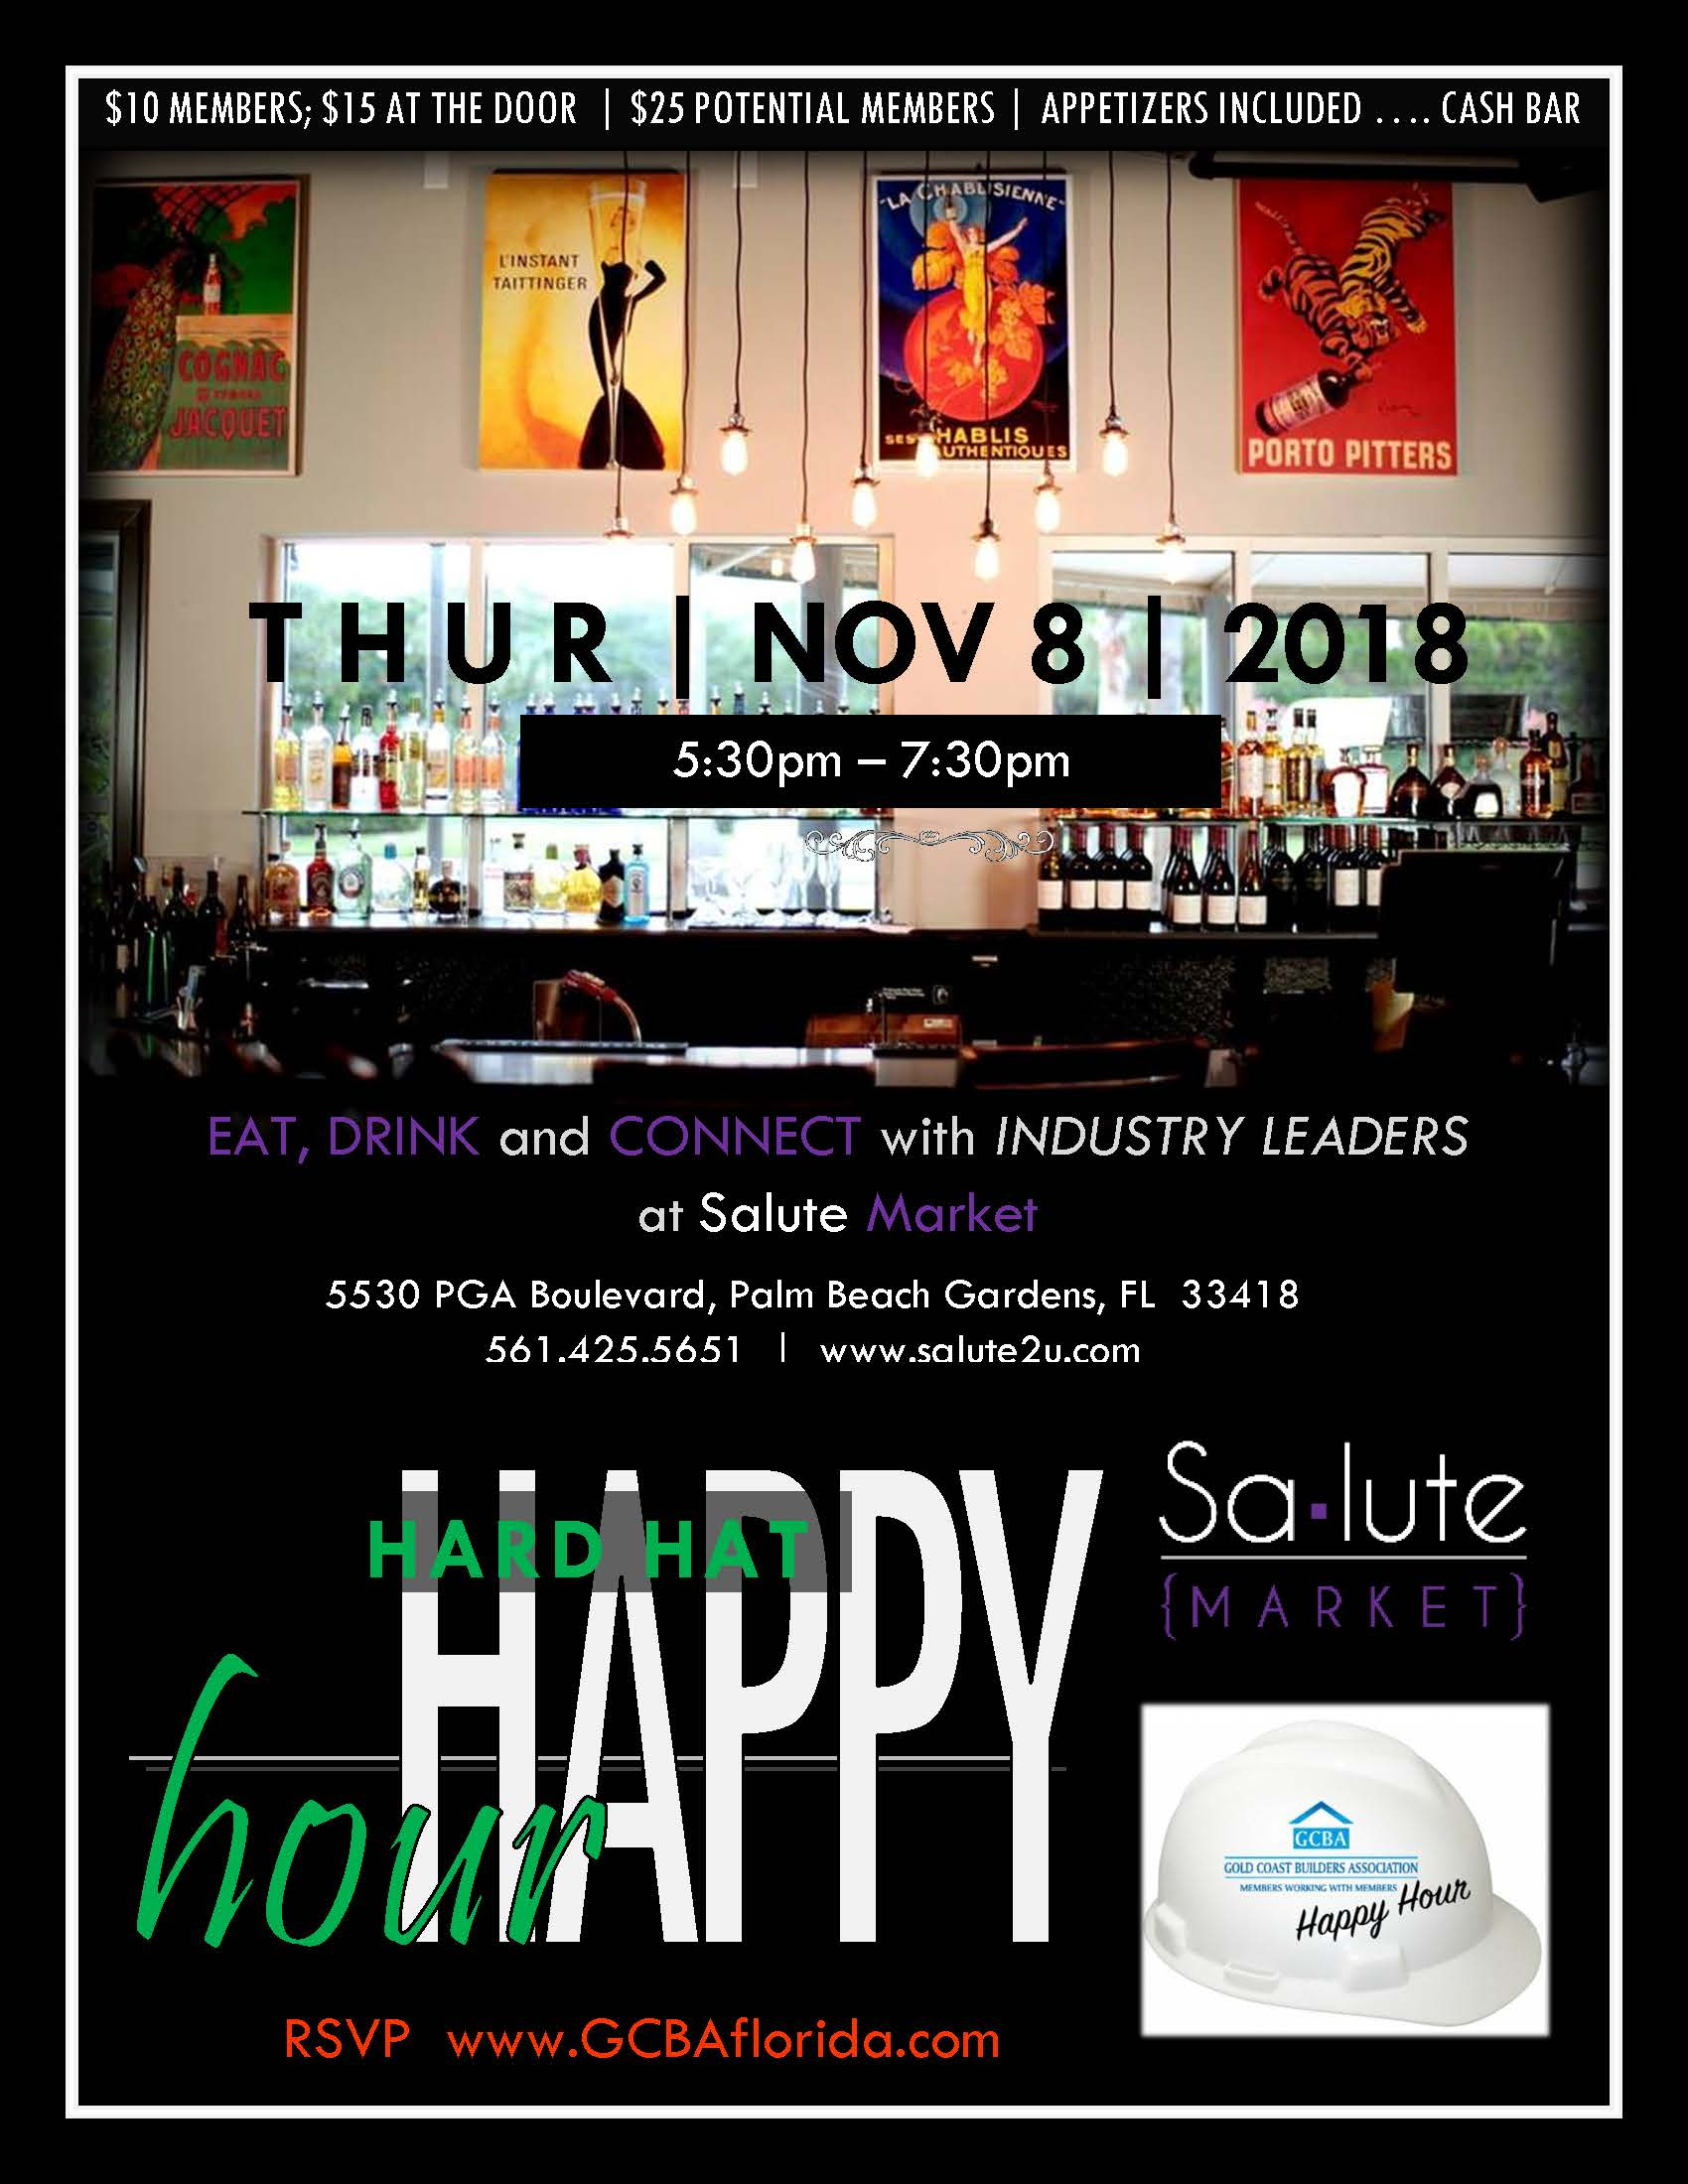 Hard Hat Happy Hour Flyer - November